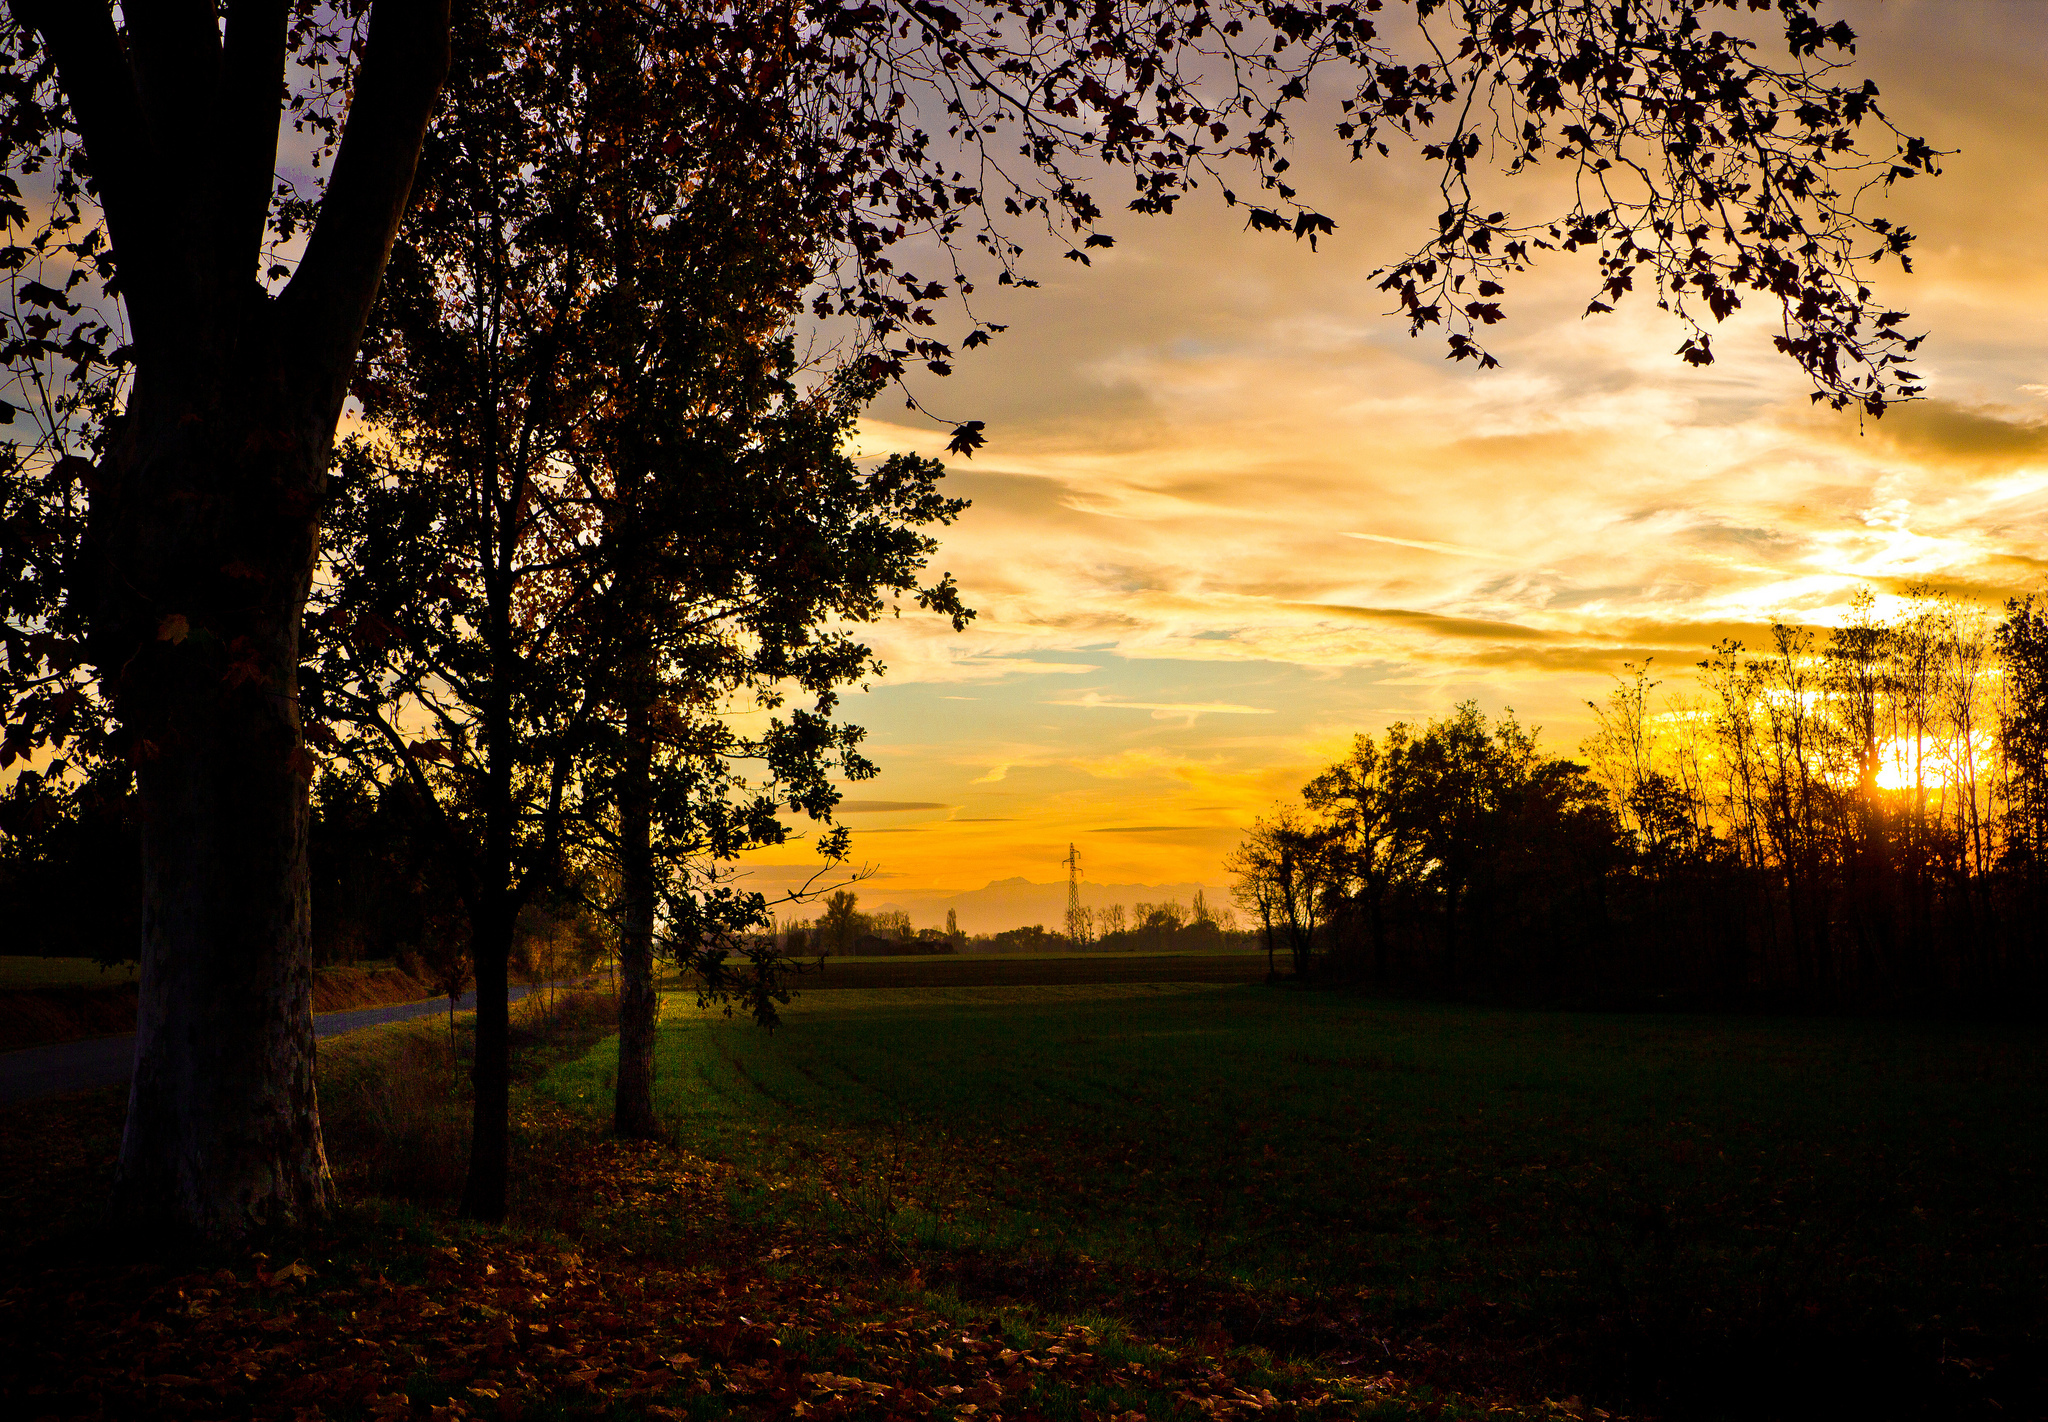 пара закат парк осень  № 1603064 бесплатно